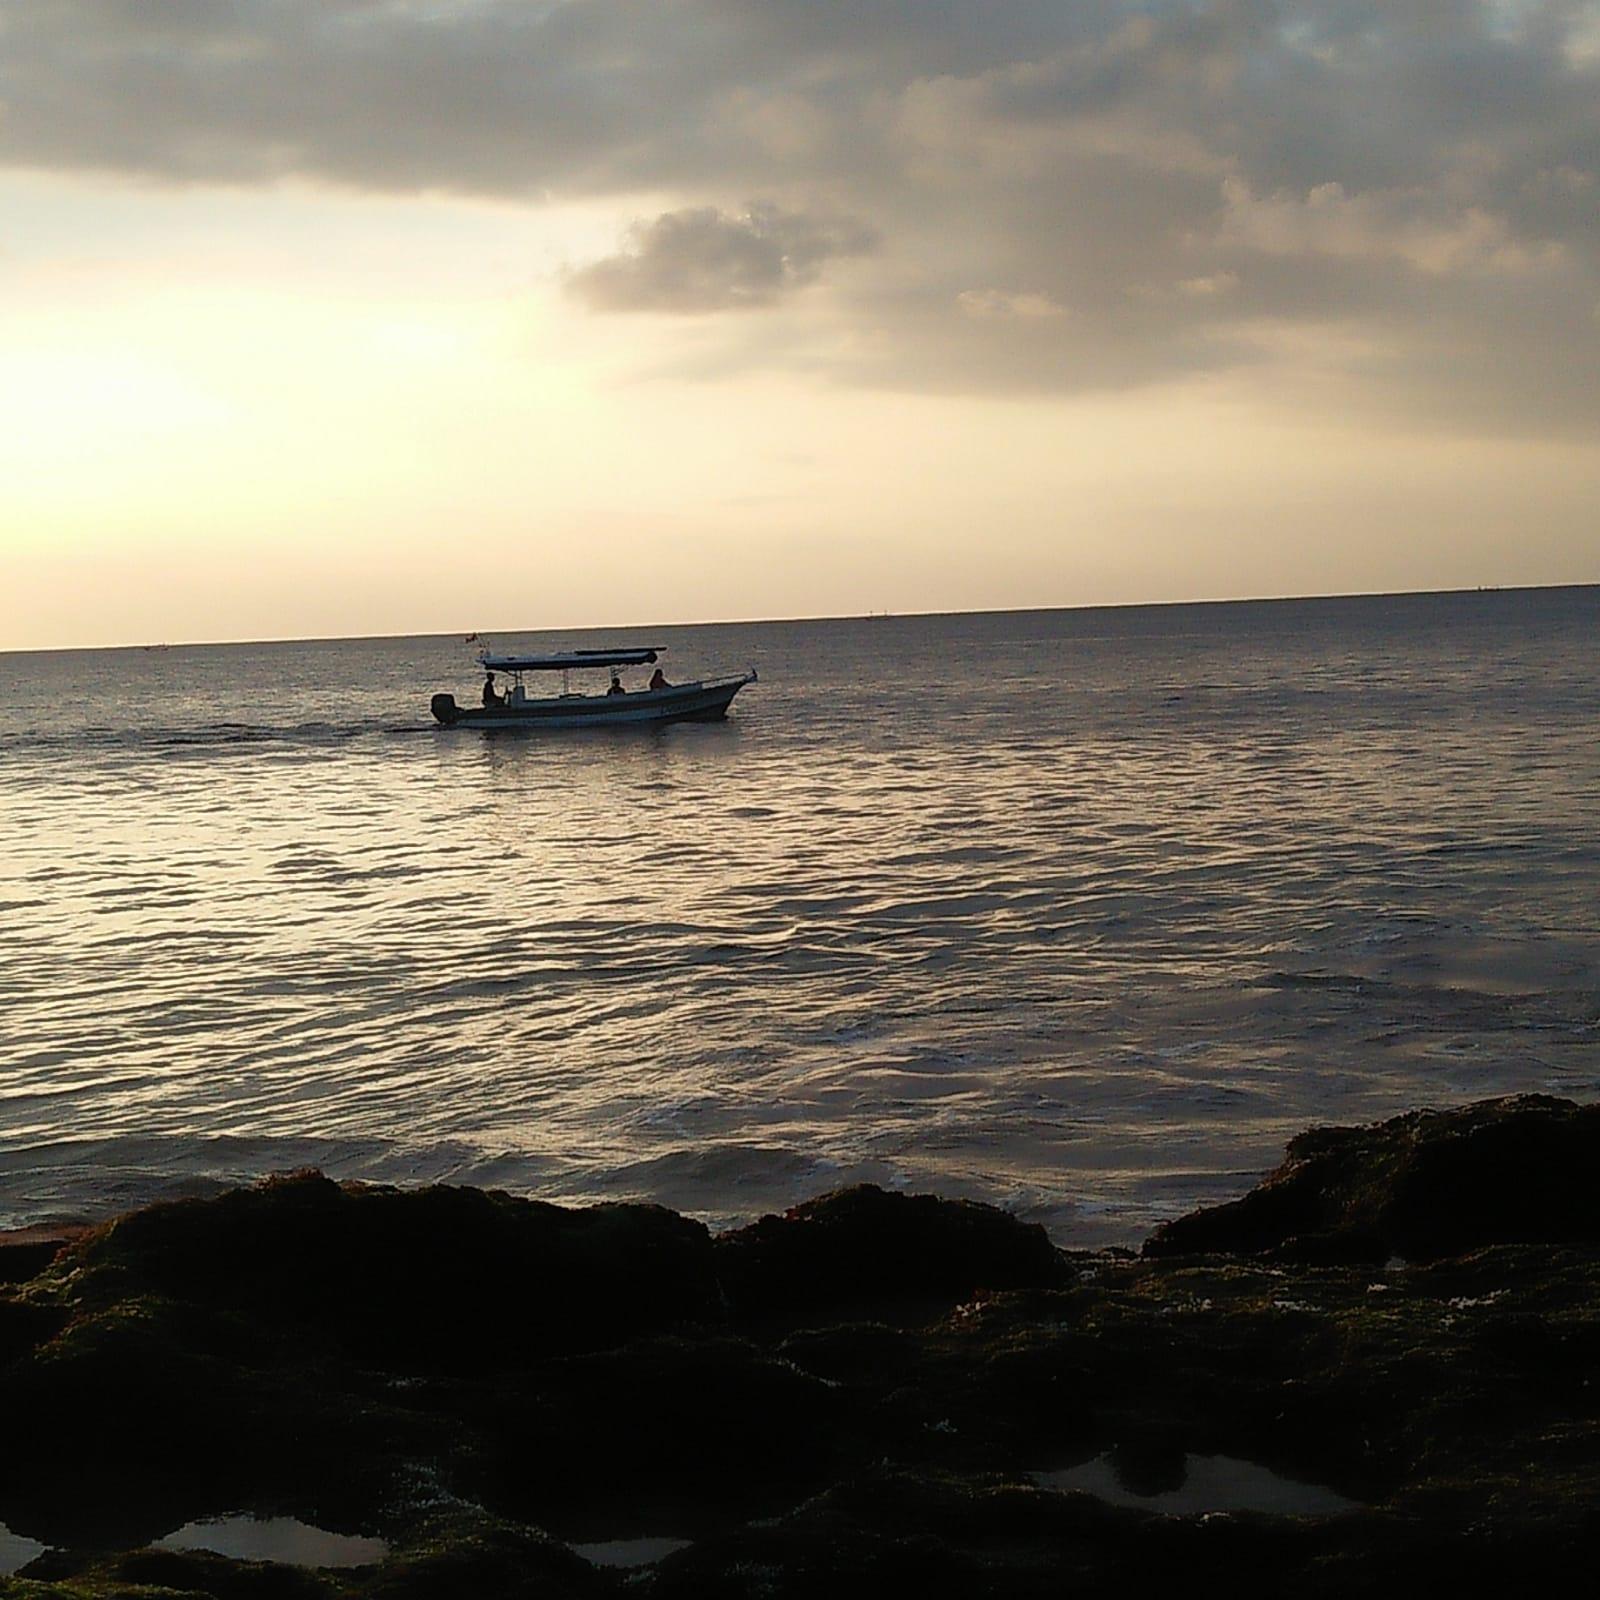 Ilustrasi Pantai Tegal Wangi Jimbaran. Foto: Gita Welastiningtias